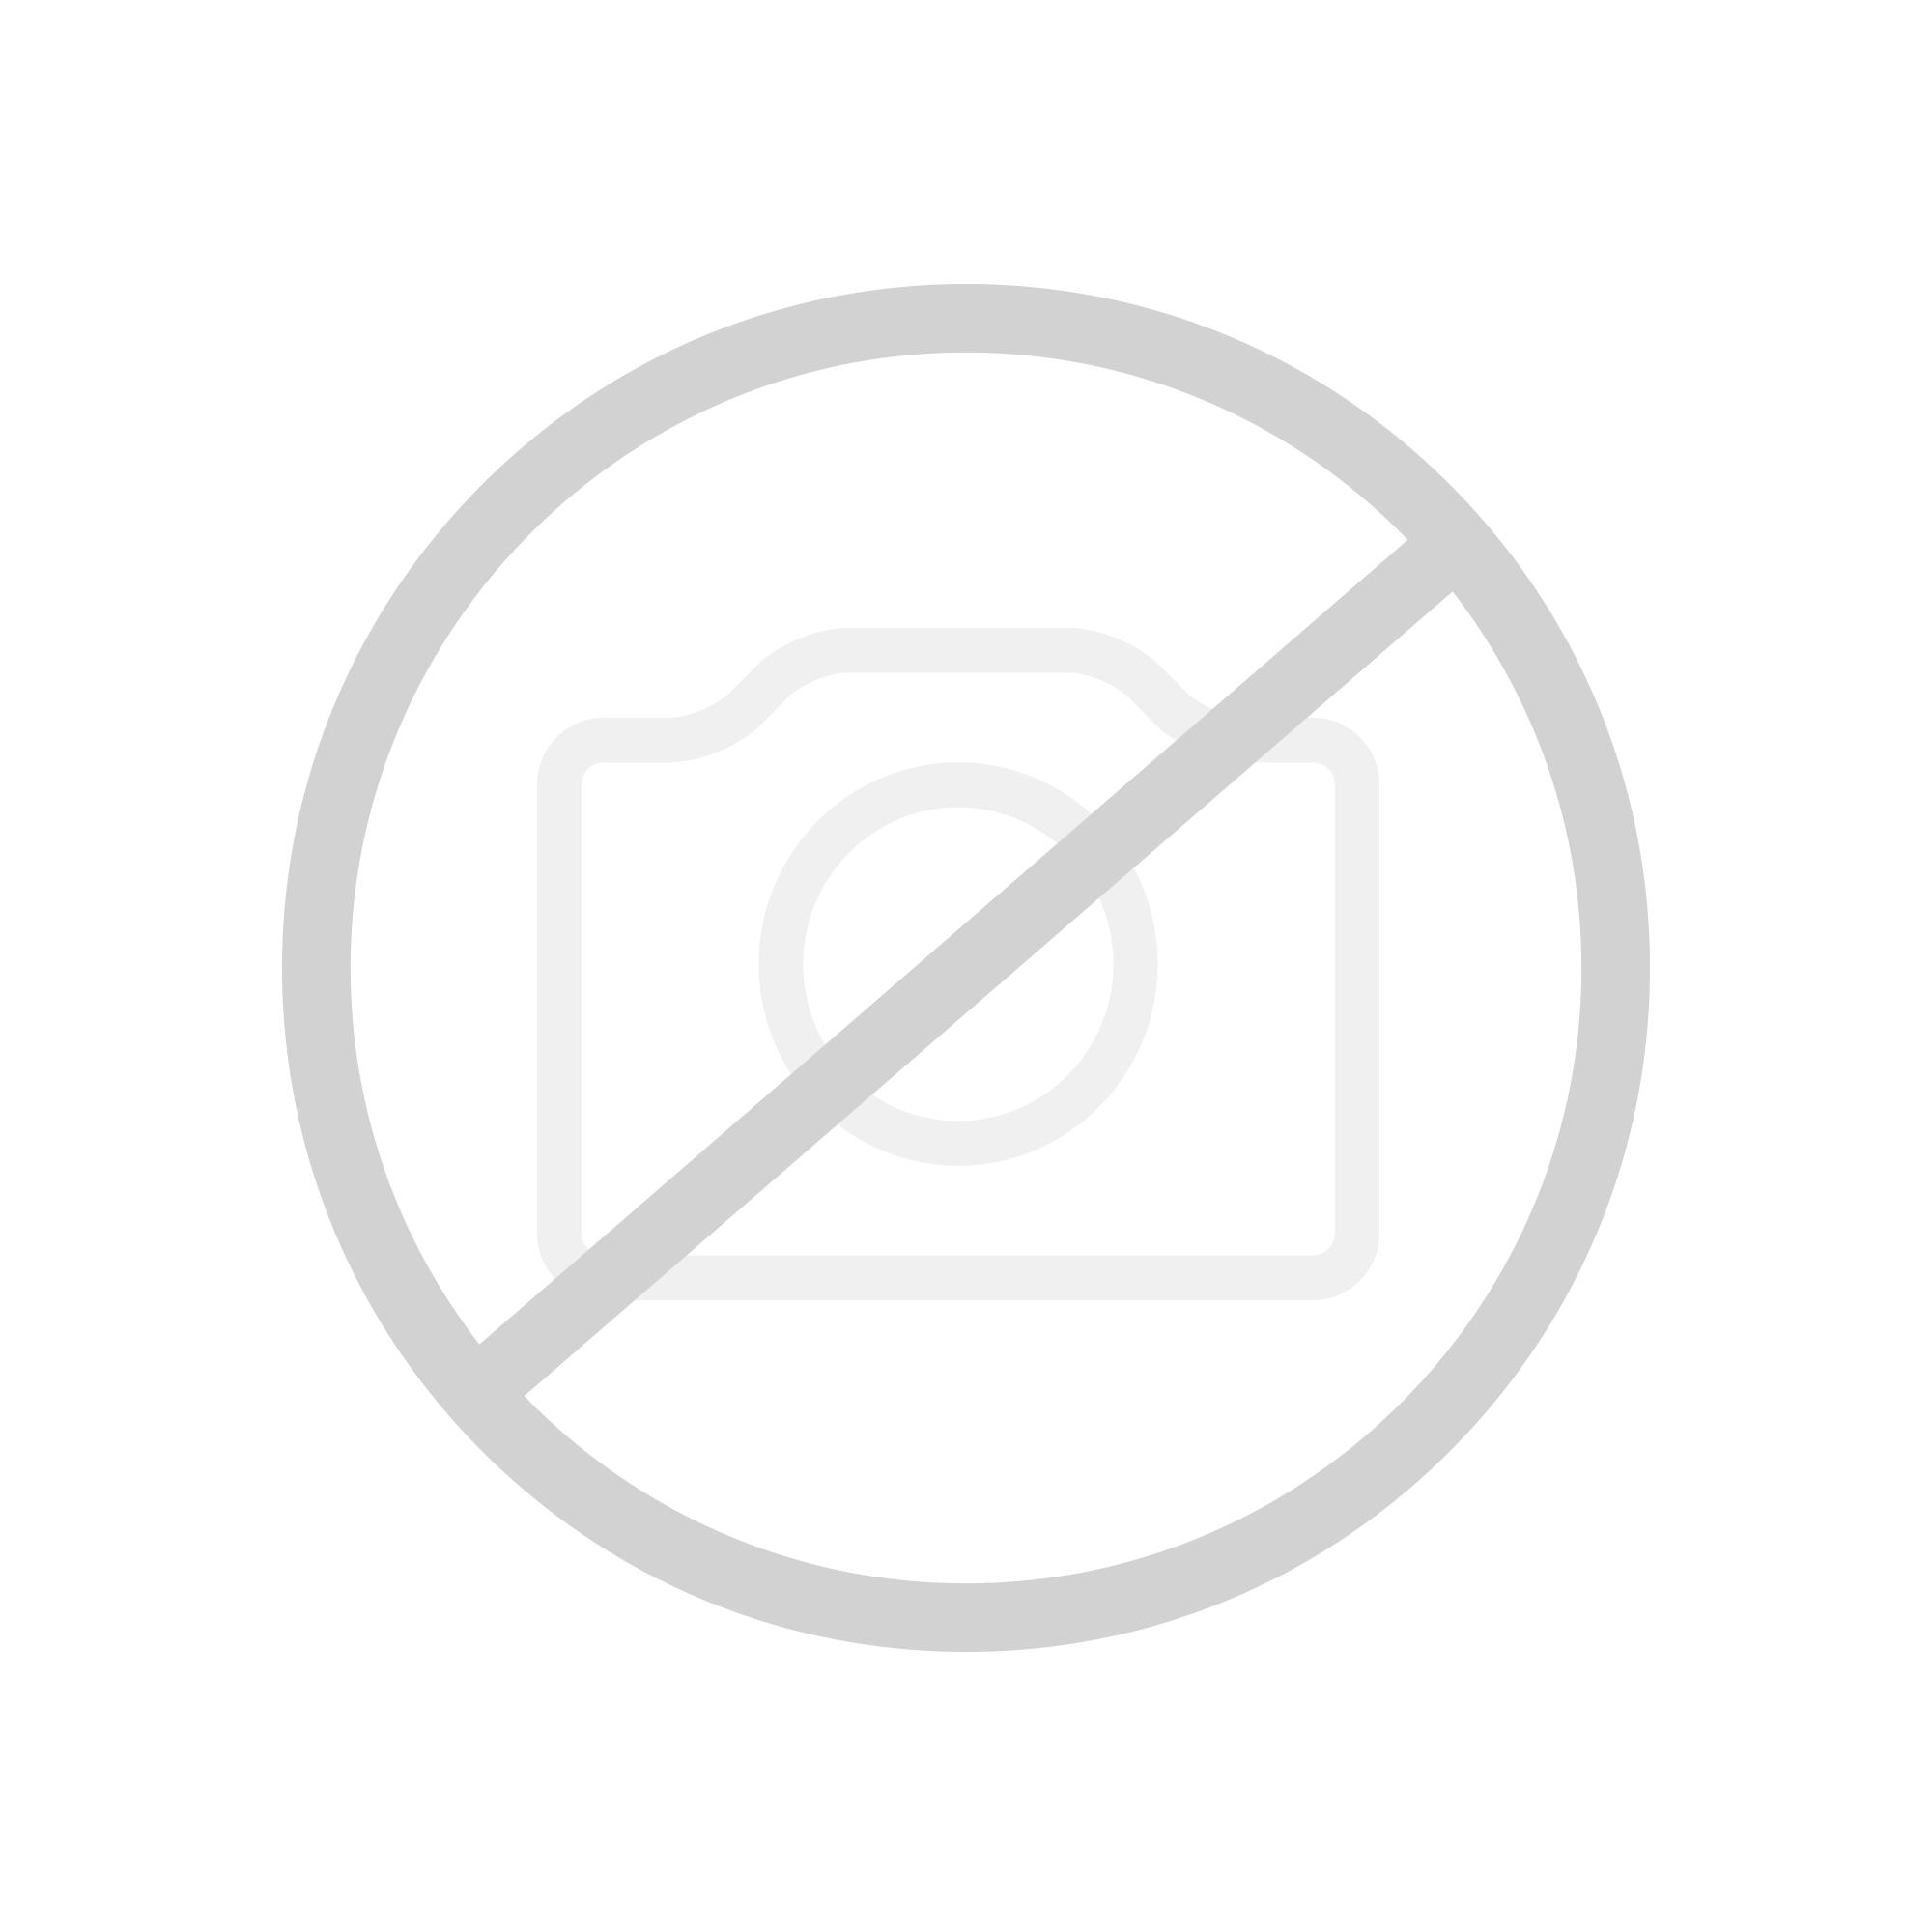 louis poulsen PH 80 Stehleuchte